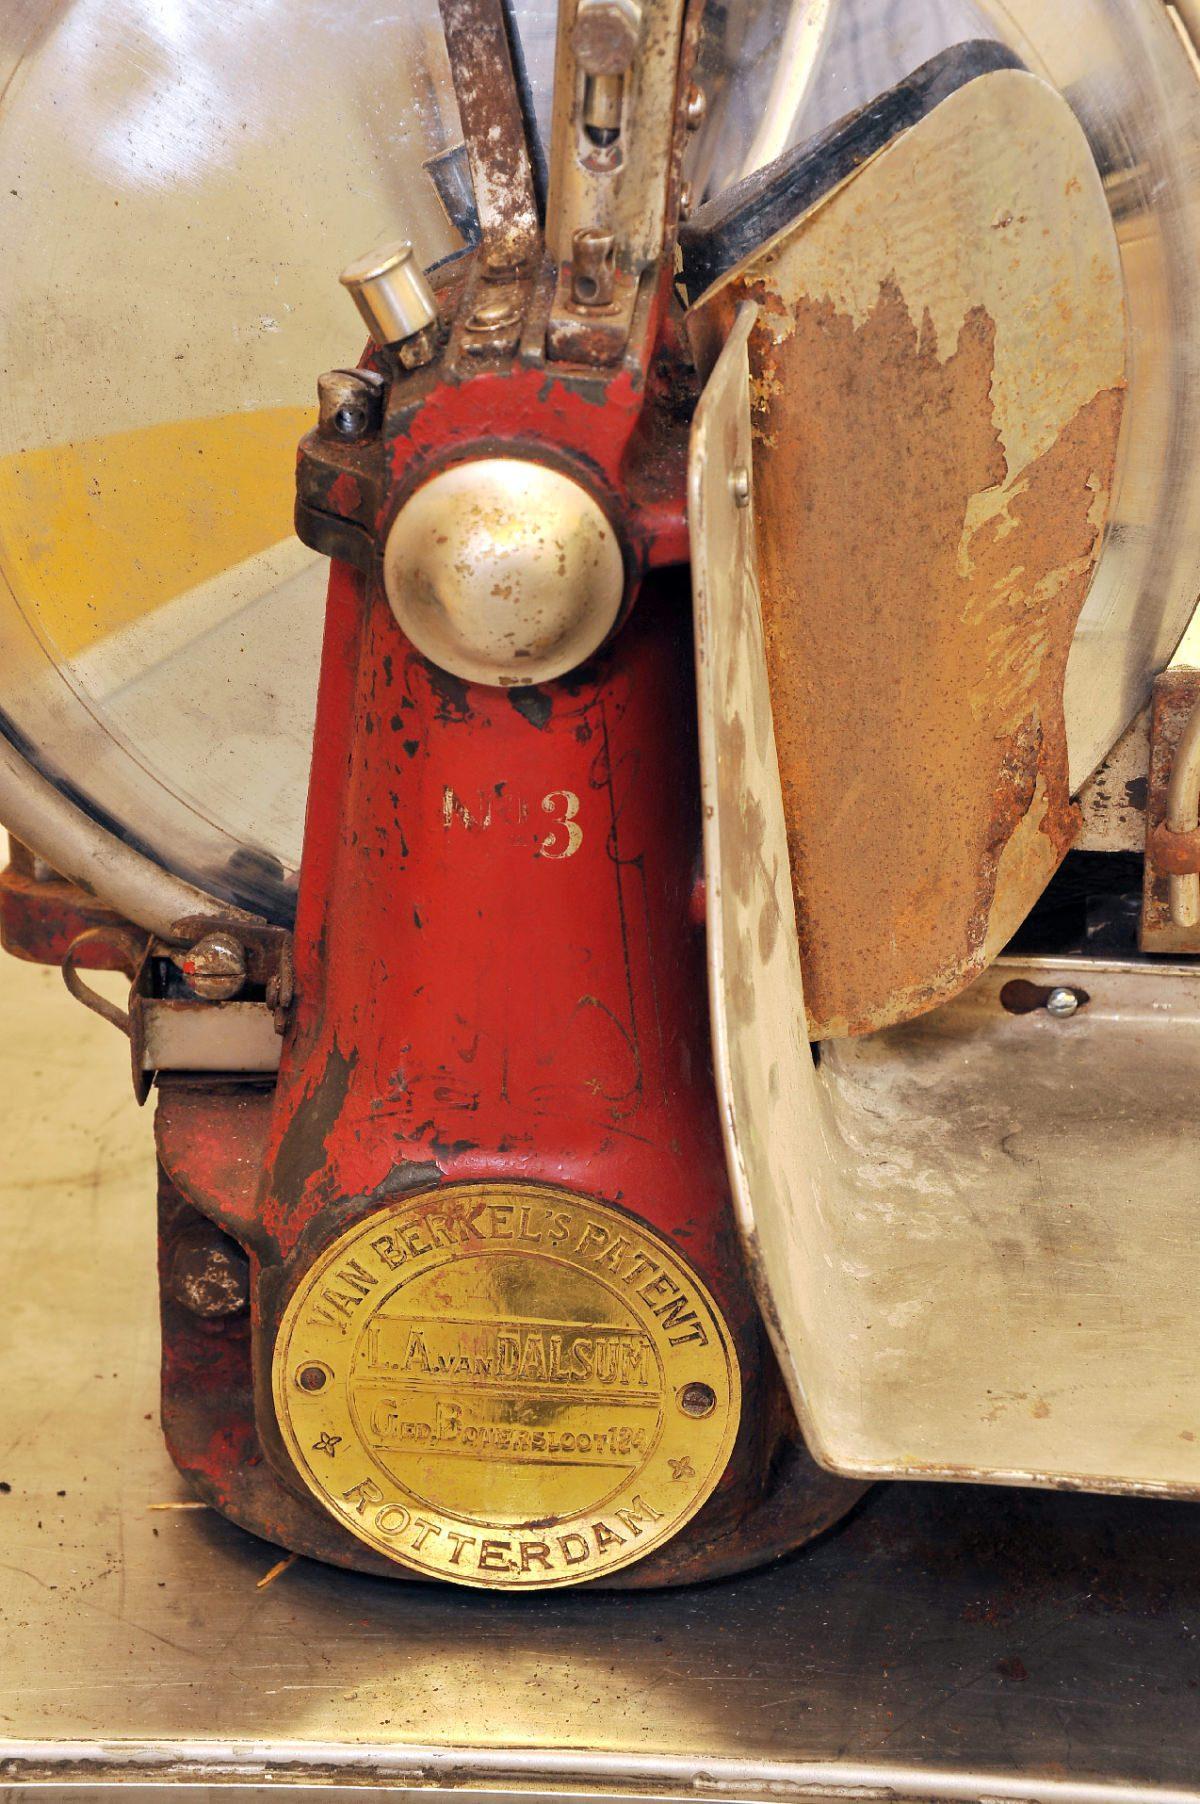 Berkel model 3 slicer before restoration